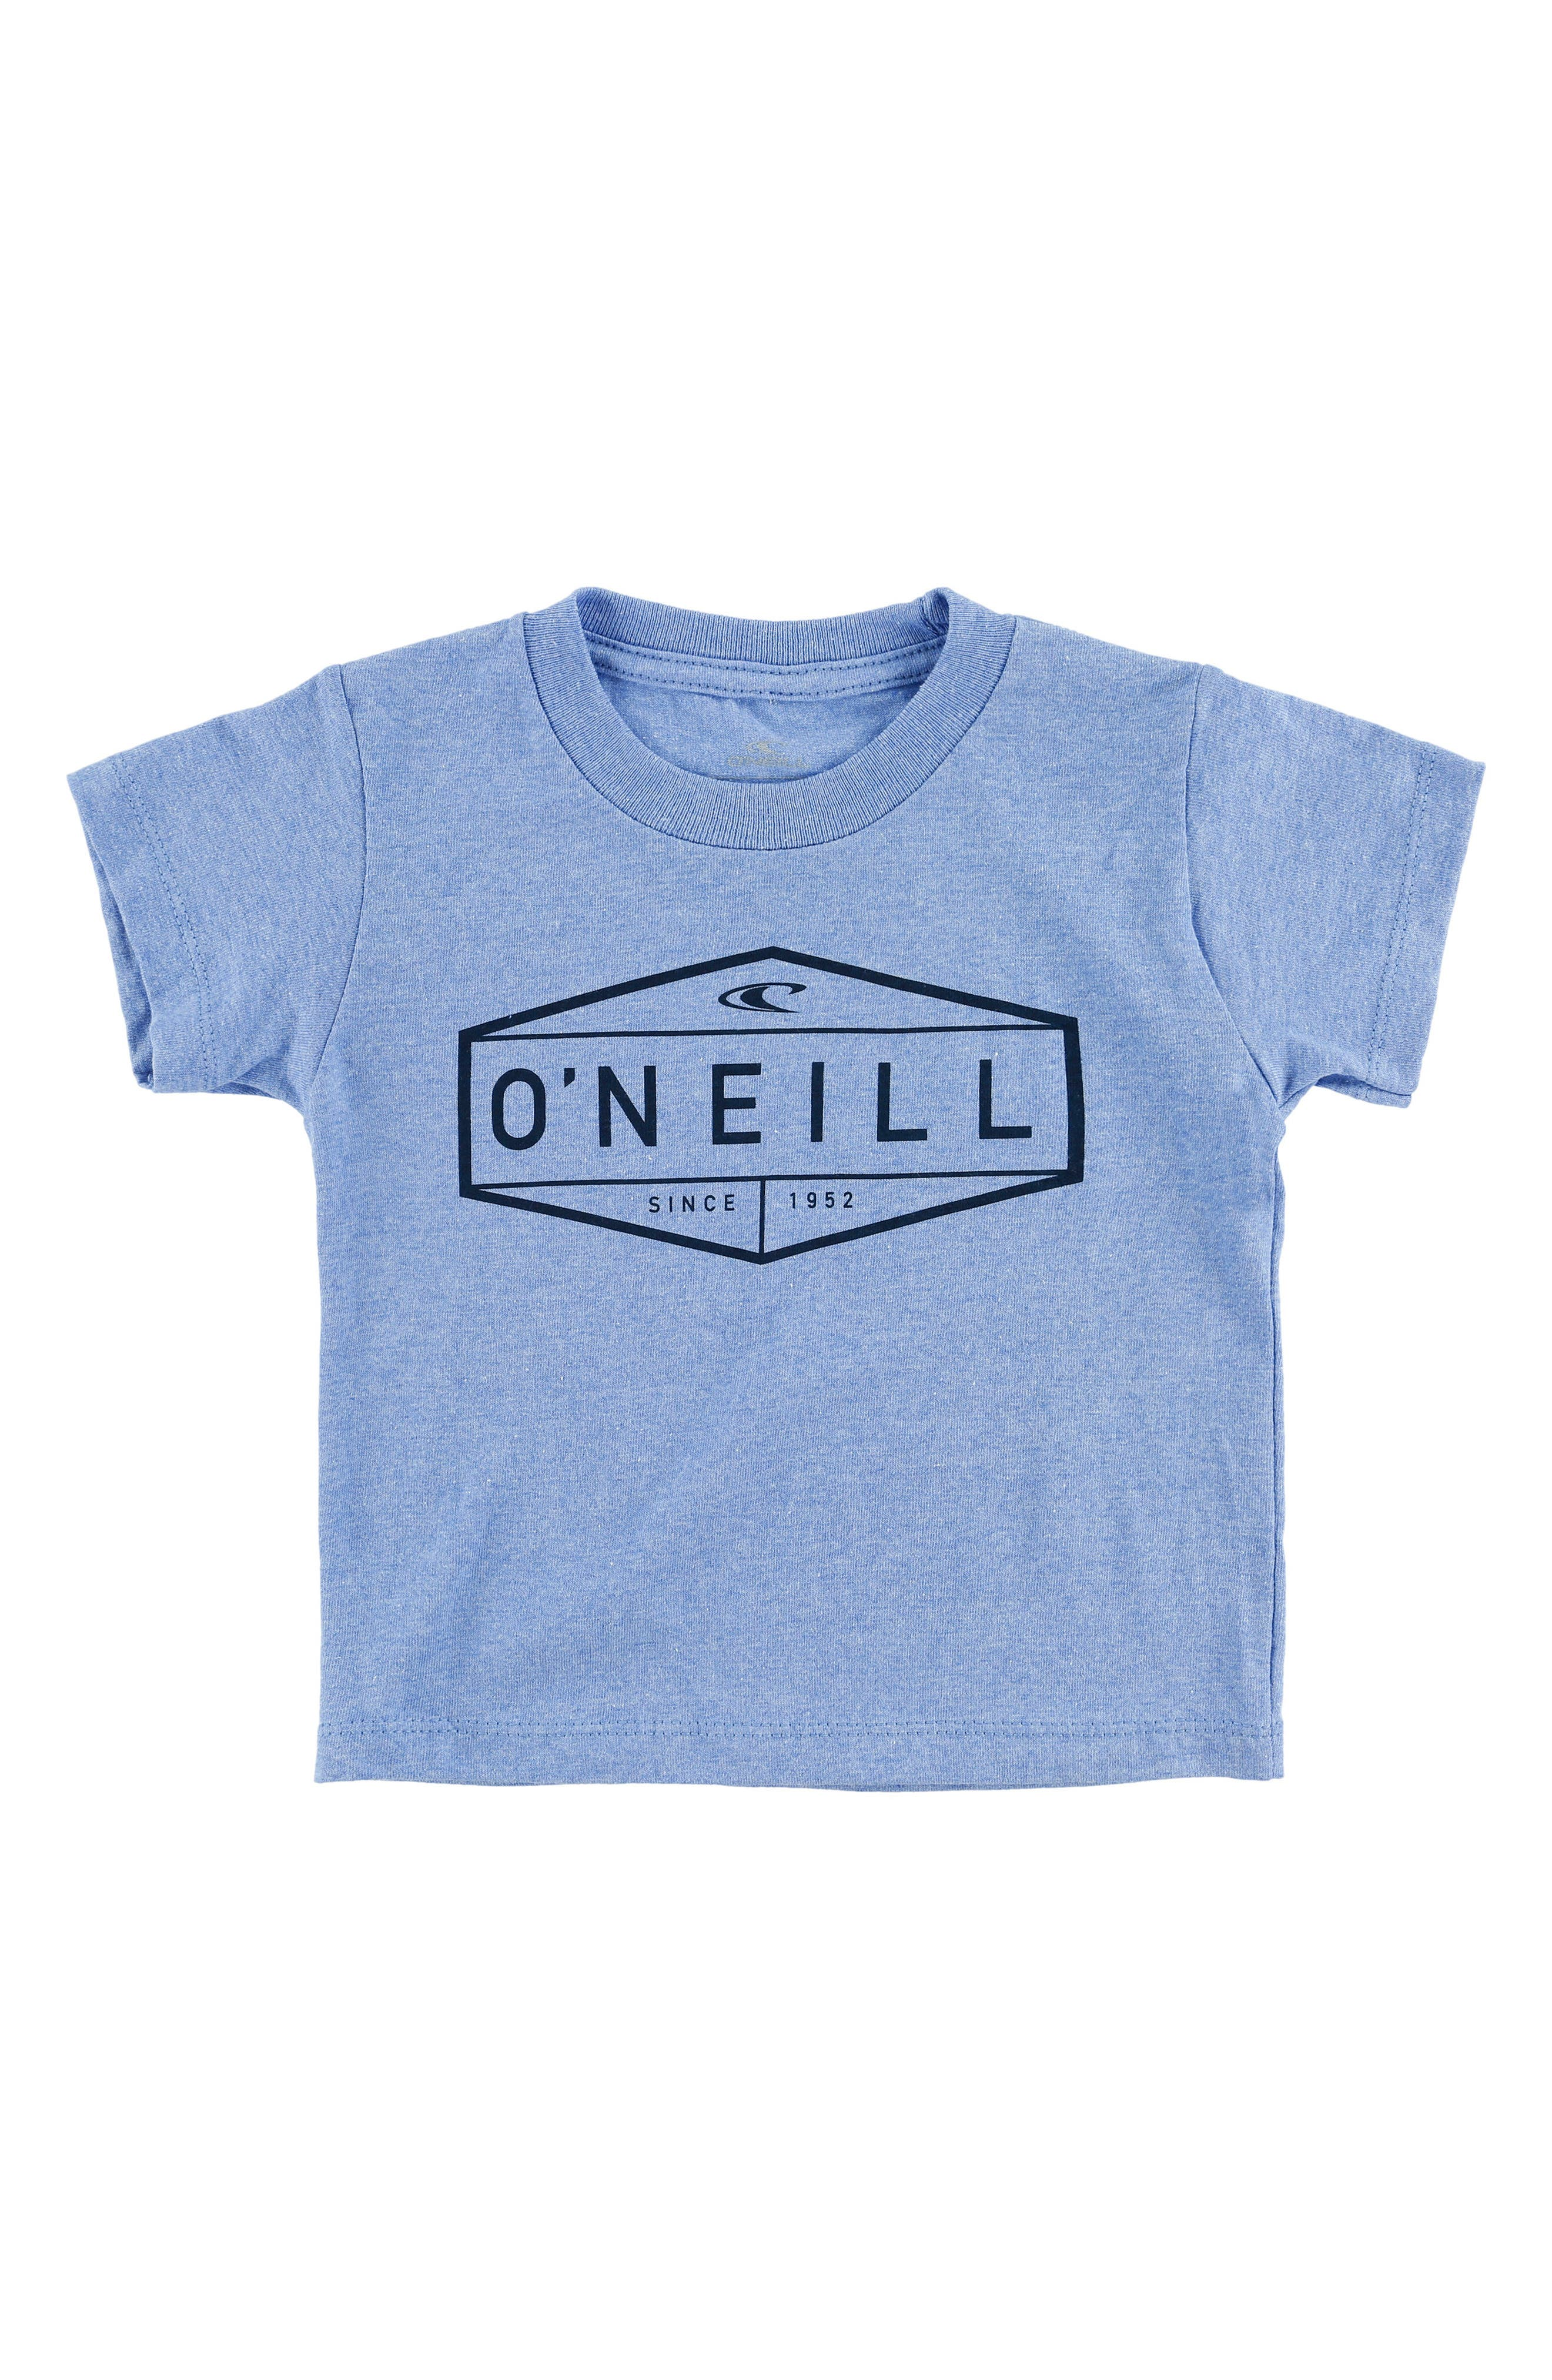 Main Image - O'Neill Boxer Graphic T-Shirt (Toddler Boys)